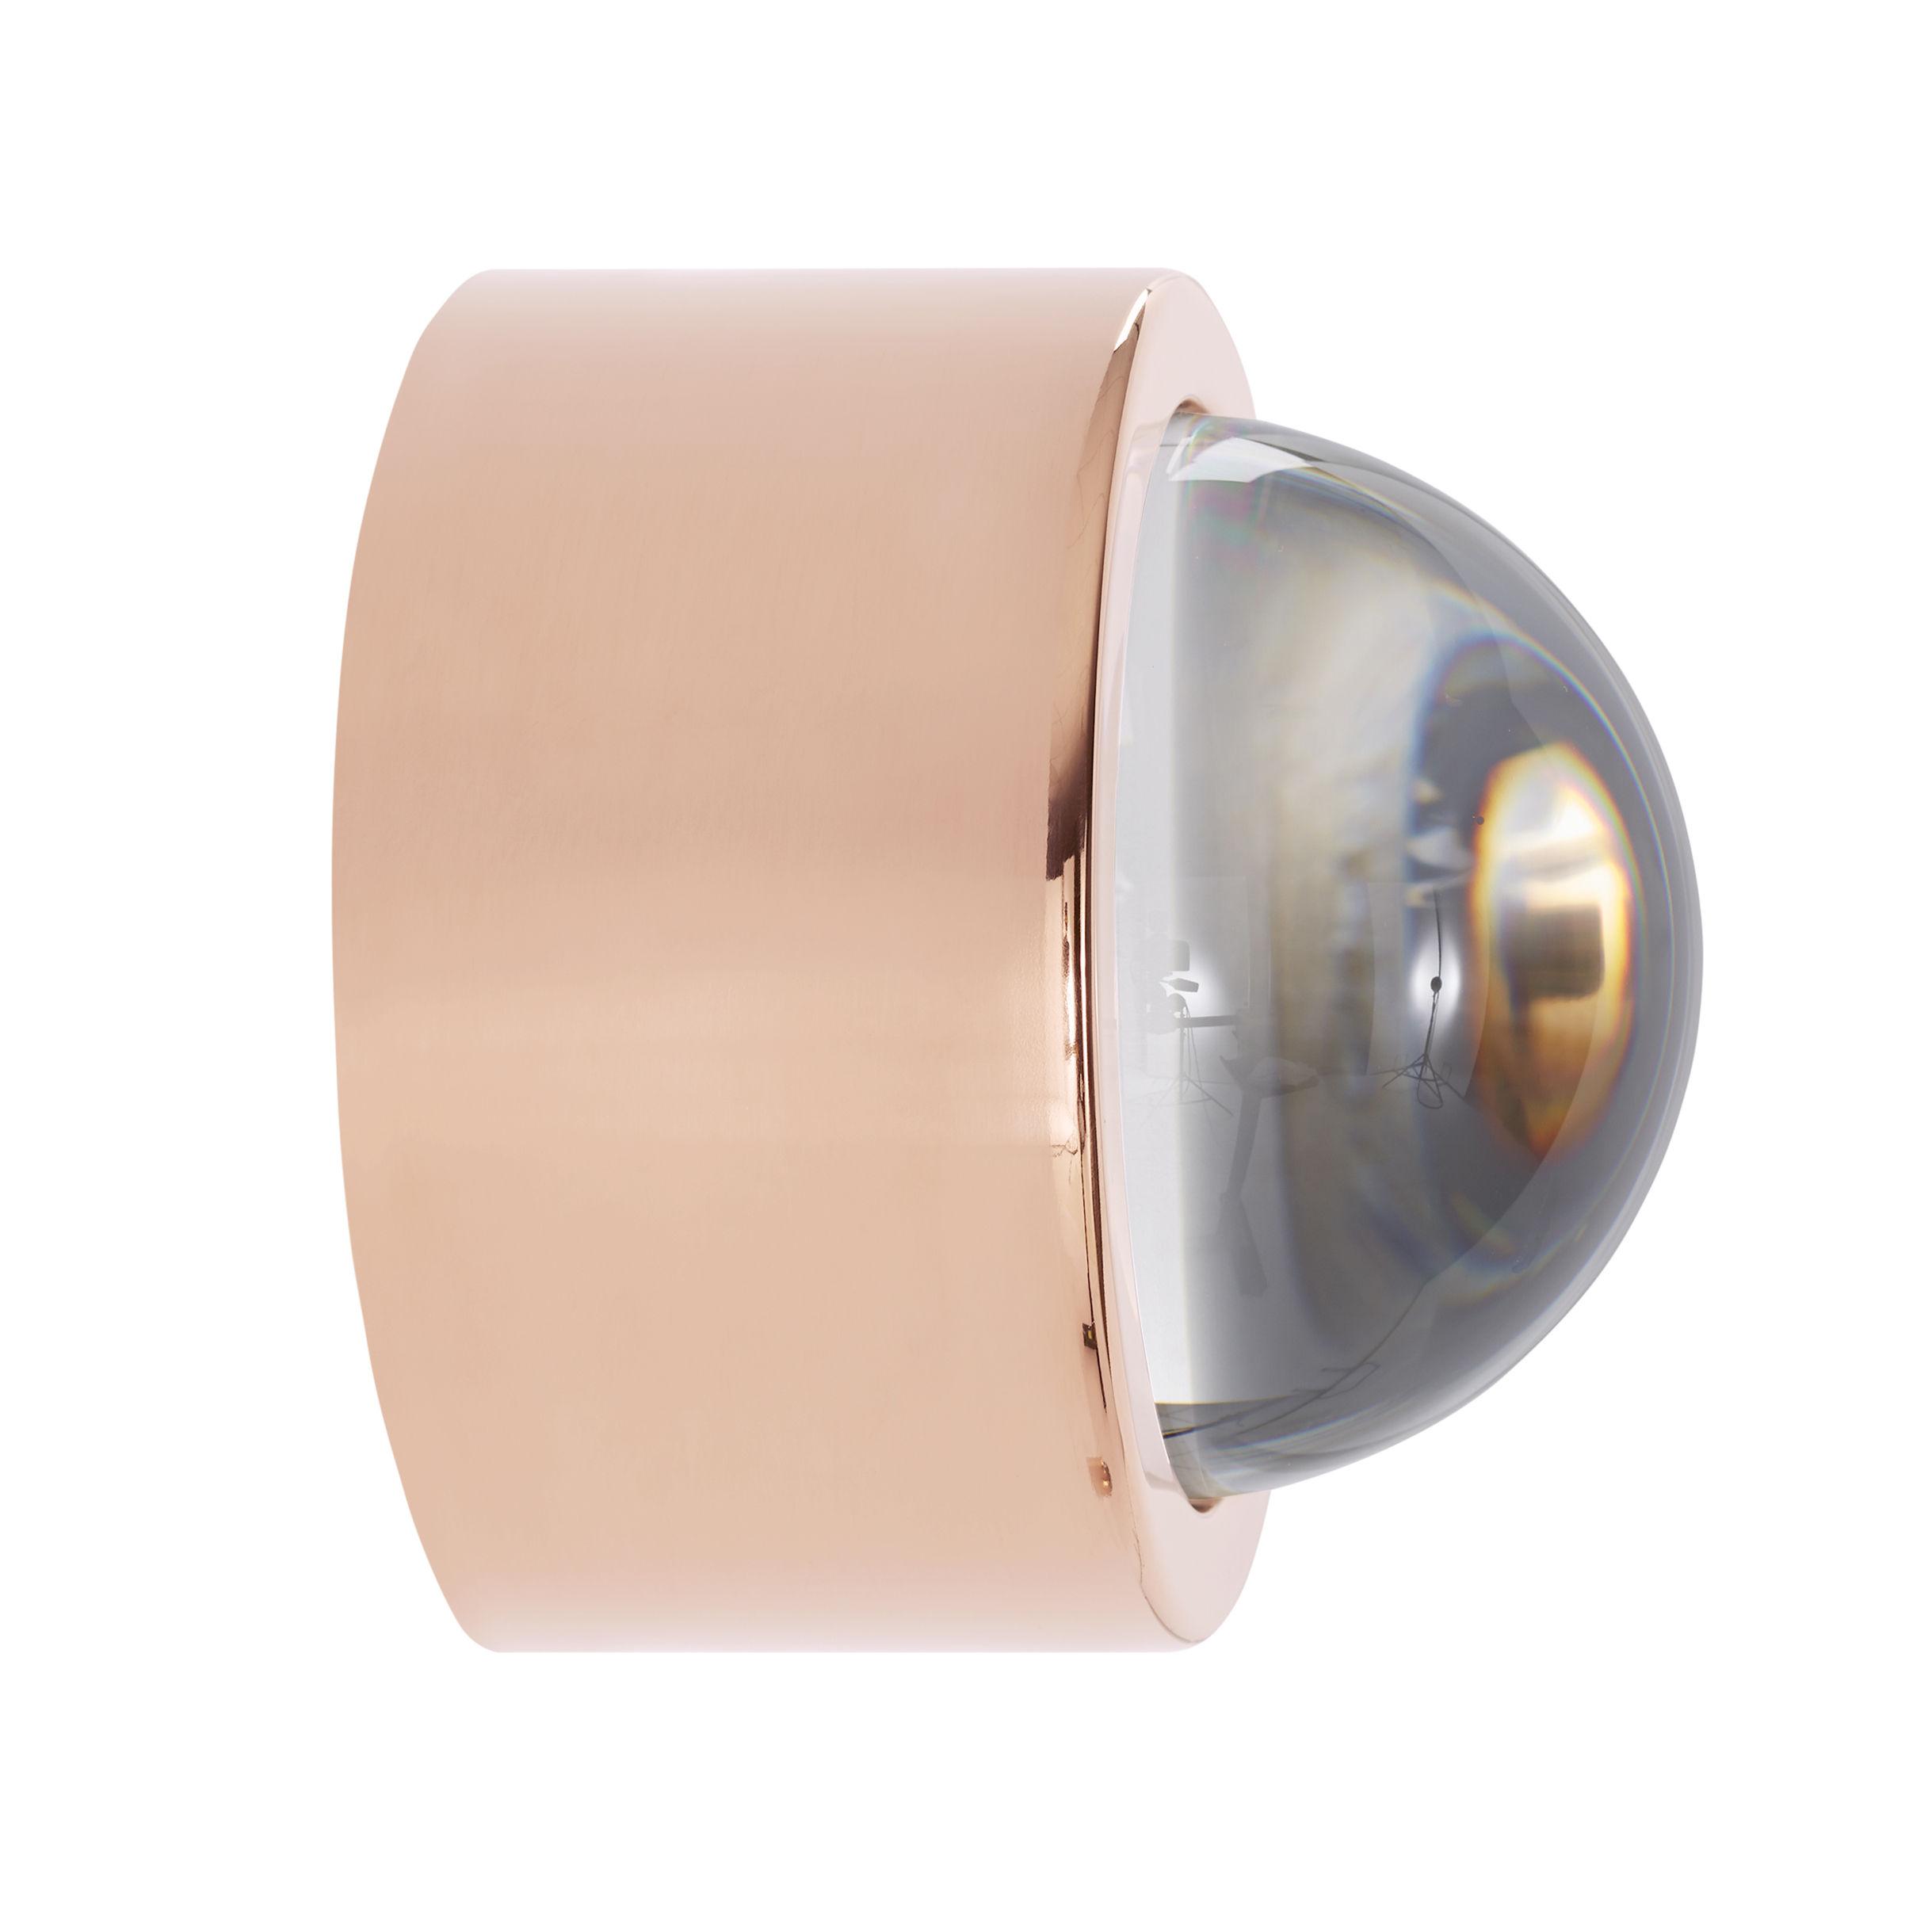 applique spot led ronde 10 cm cuivre tom dixon. Black Bedroom Furniture Sets. Home Design Ideas